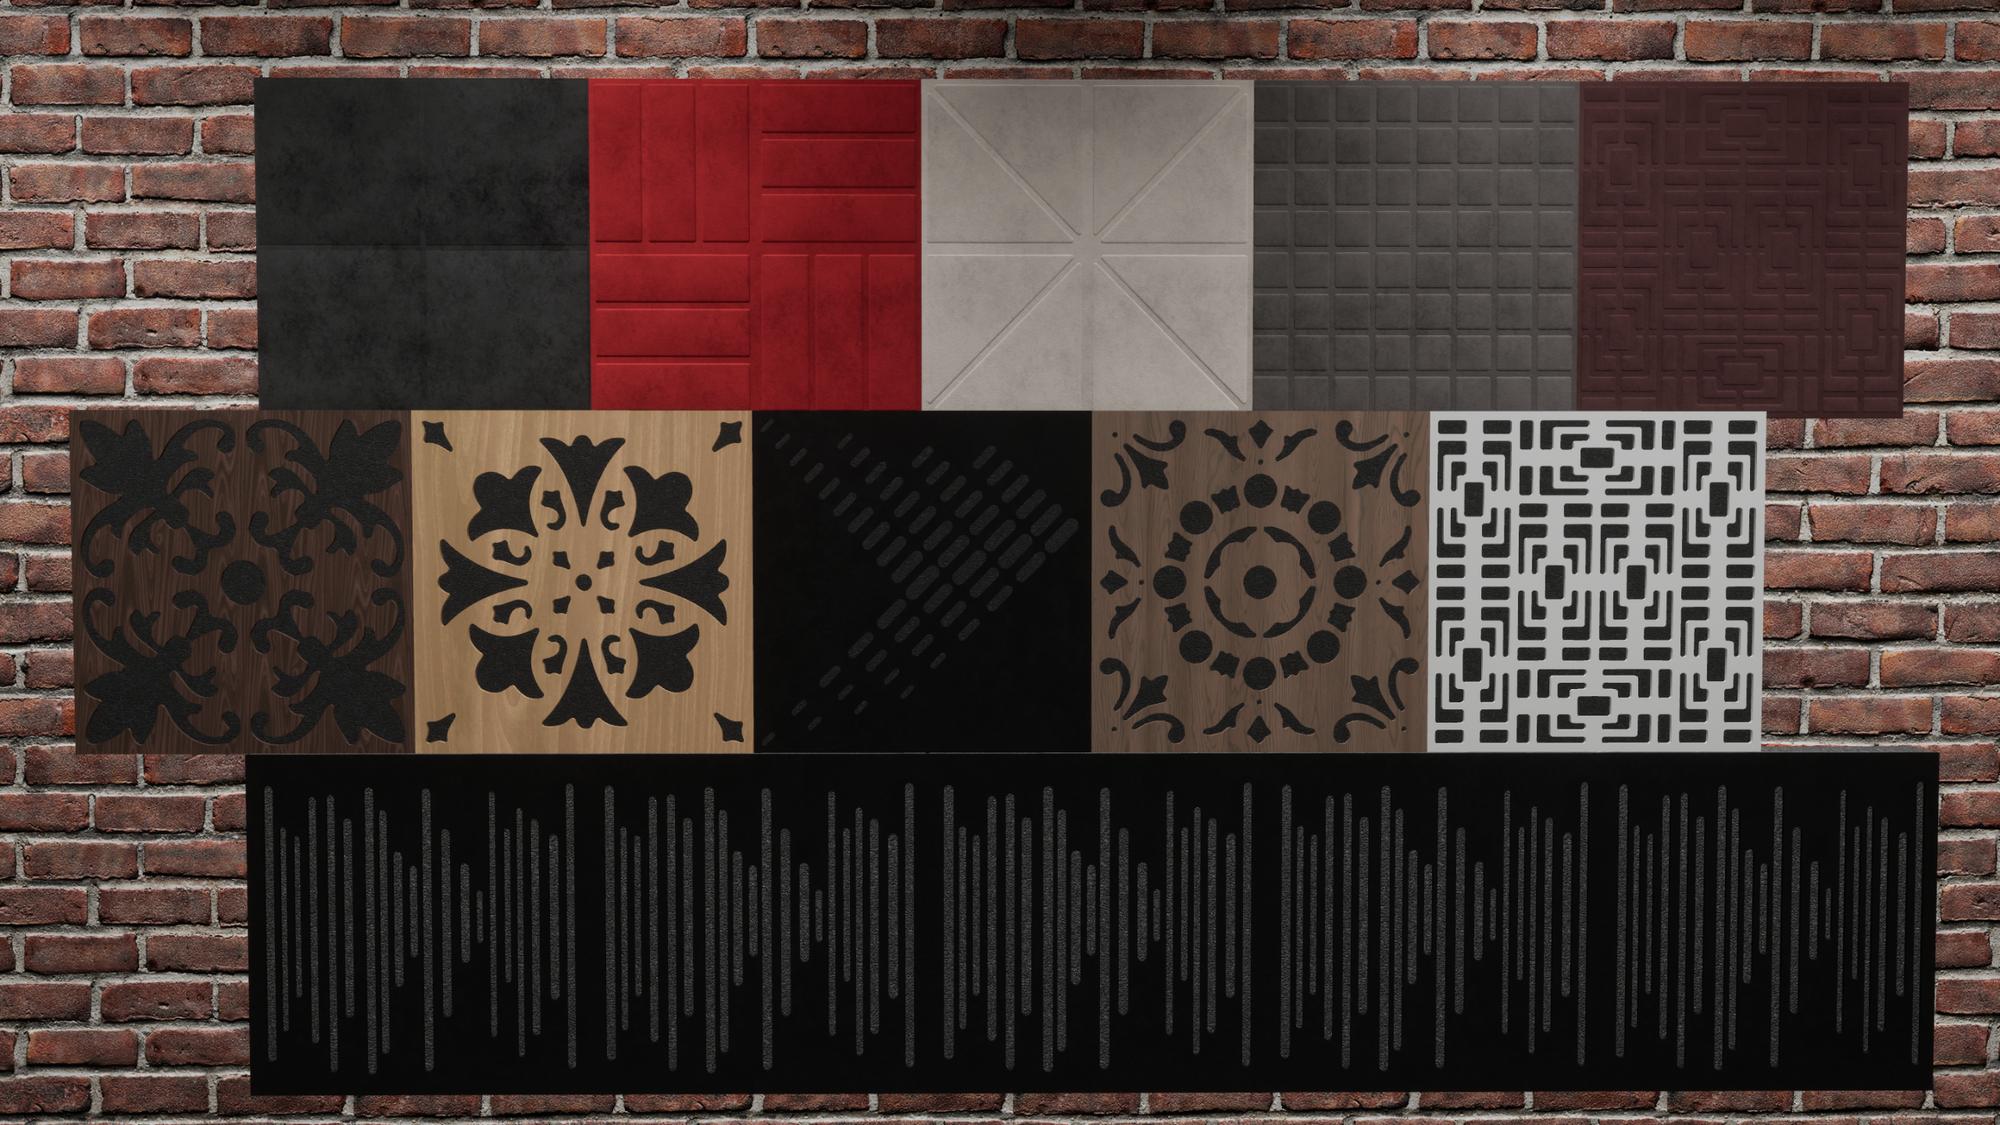 Vic wallpaper, vicpattern ultra, wavewood diffuser ultra